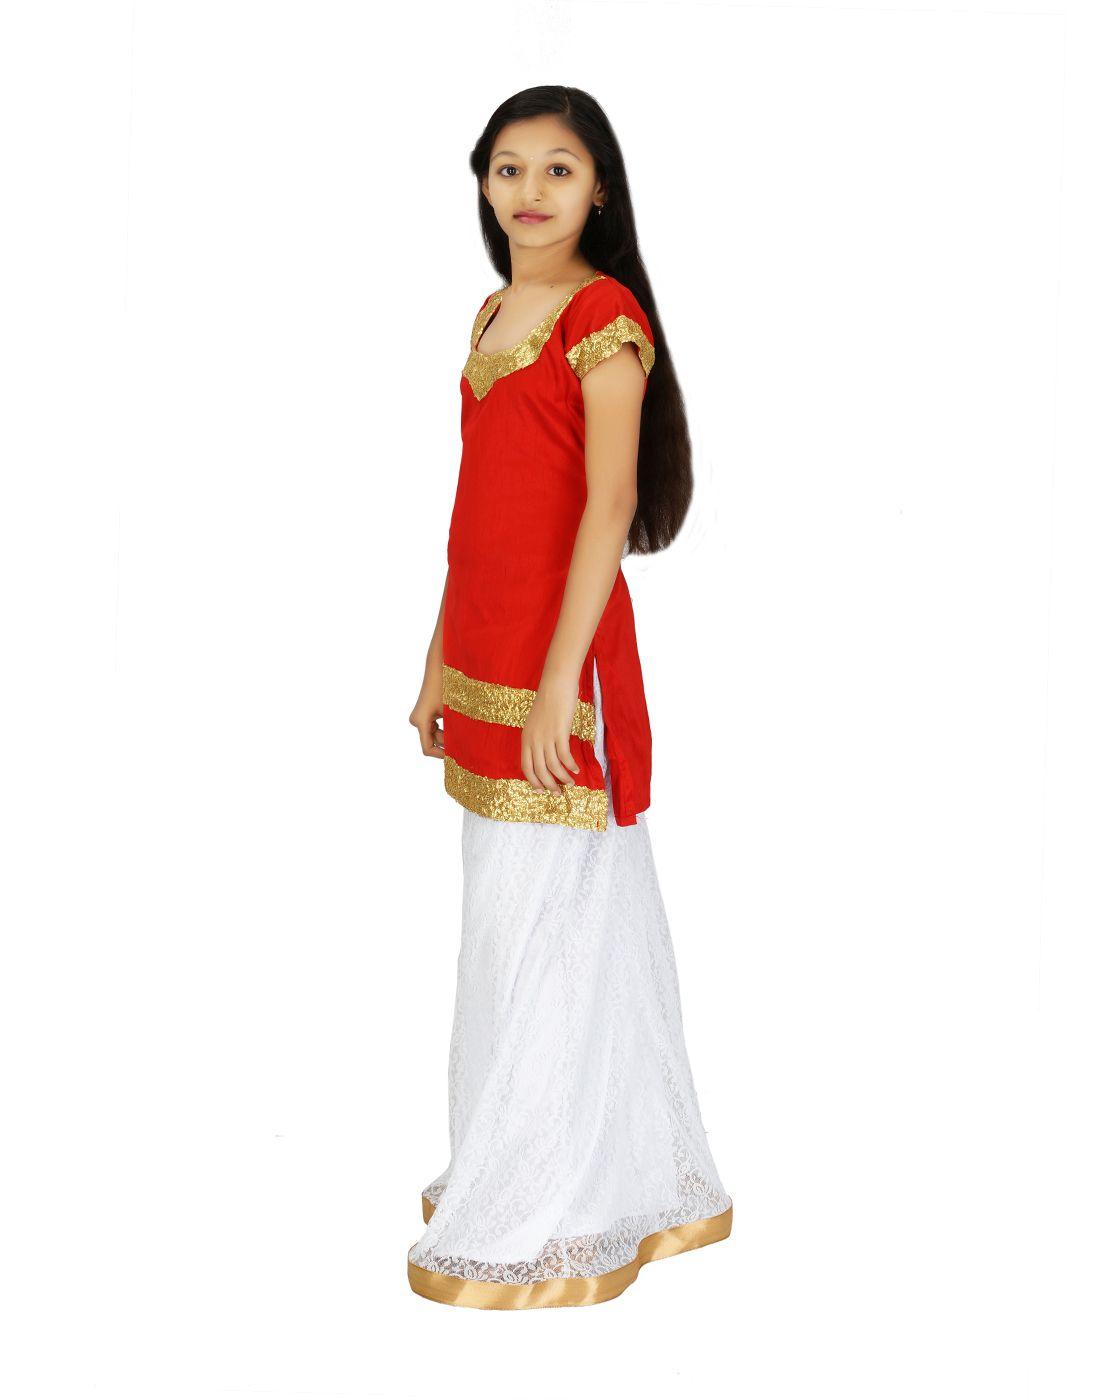 986f926b329c1 Kanchoo Girls Lehenga Choli Western Wear Self Design Lehenga Choli - Buy  Kanchoo Girls Lehenga Choli Western Wear Self Design Lehenga Choli Online  at Low ...